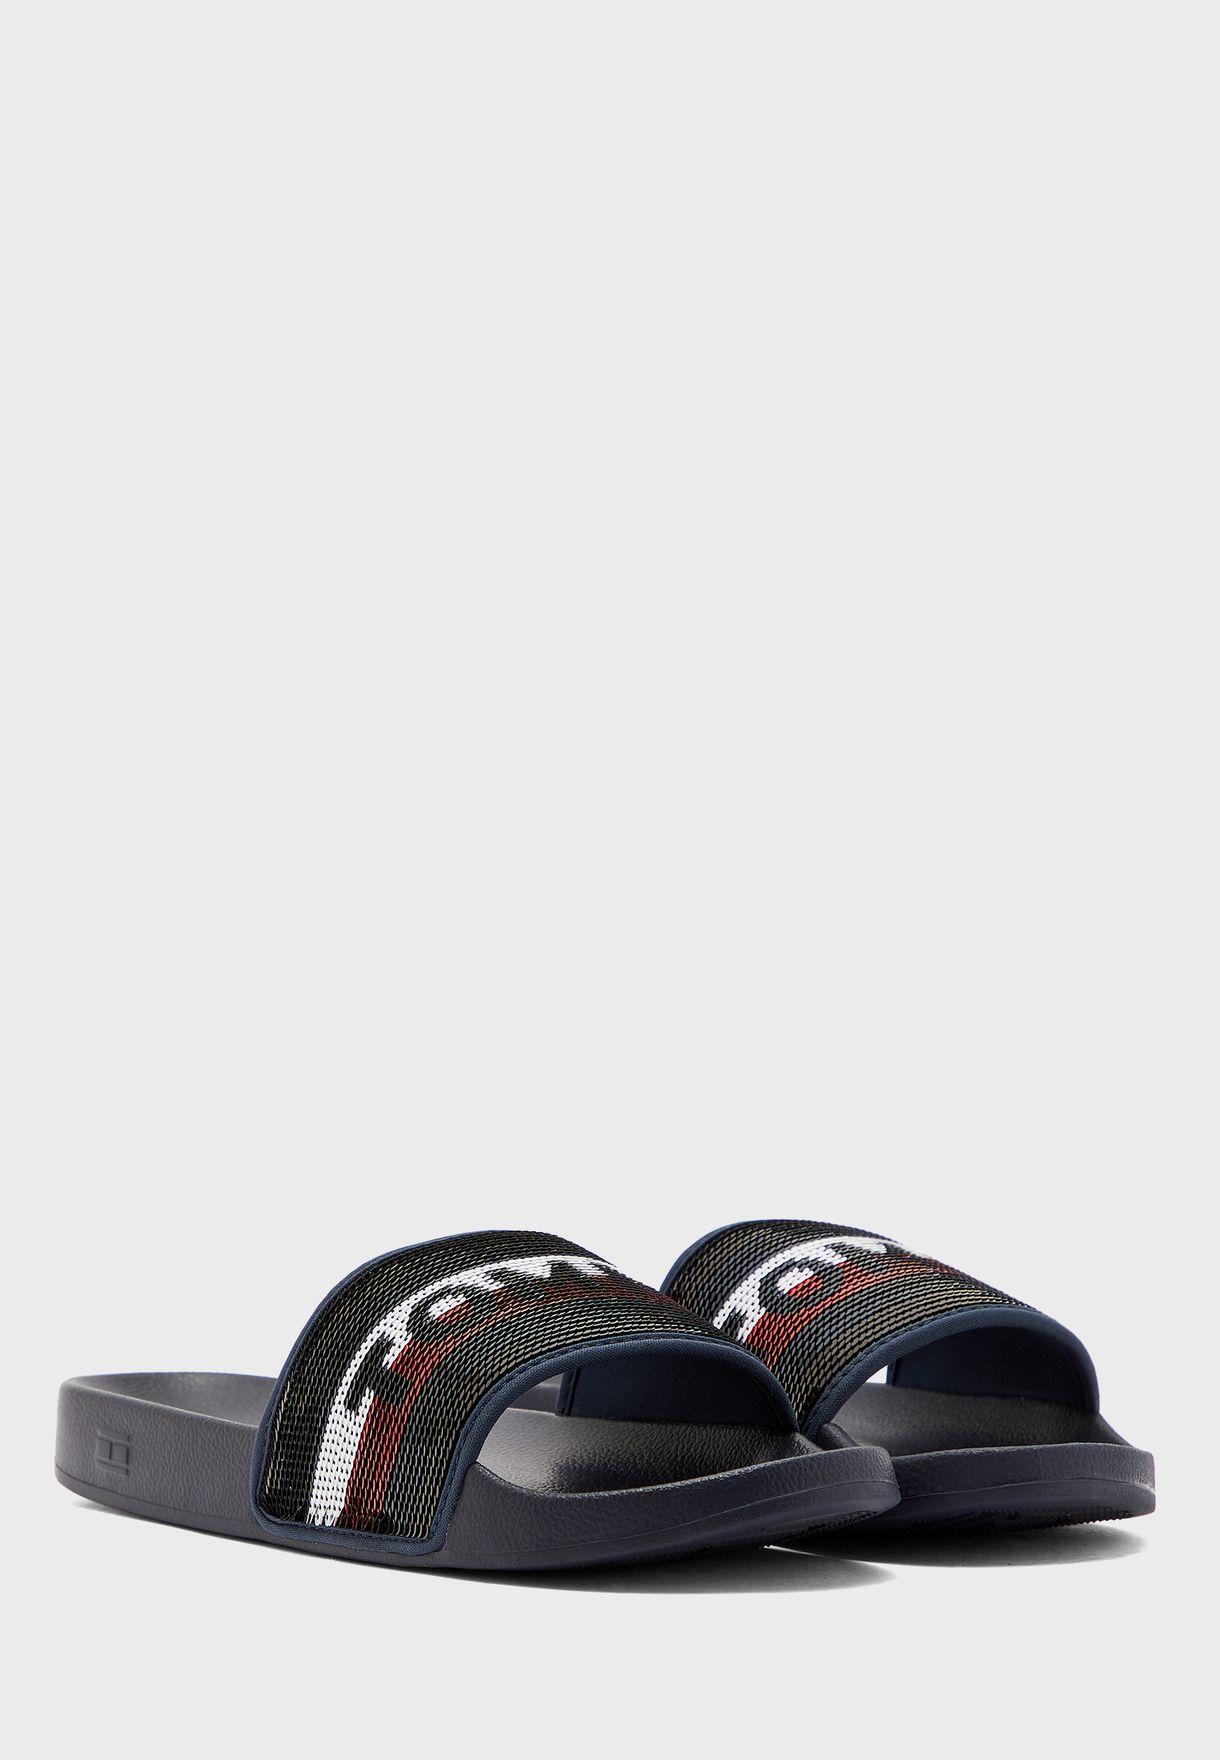 Tommy Sequins Pool Flat Sandal - DWS